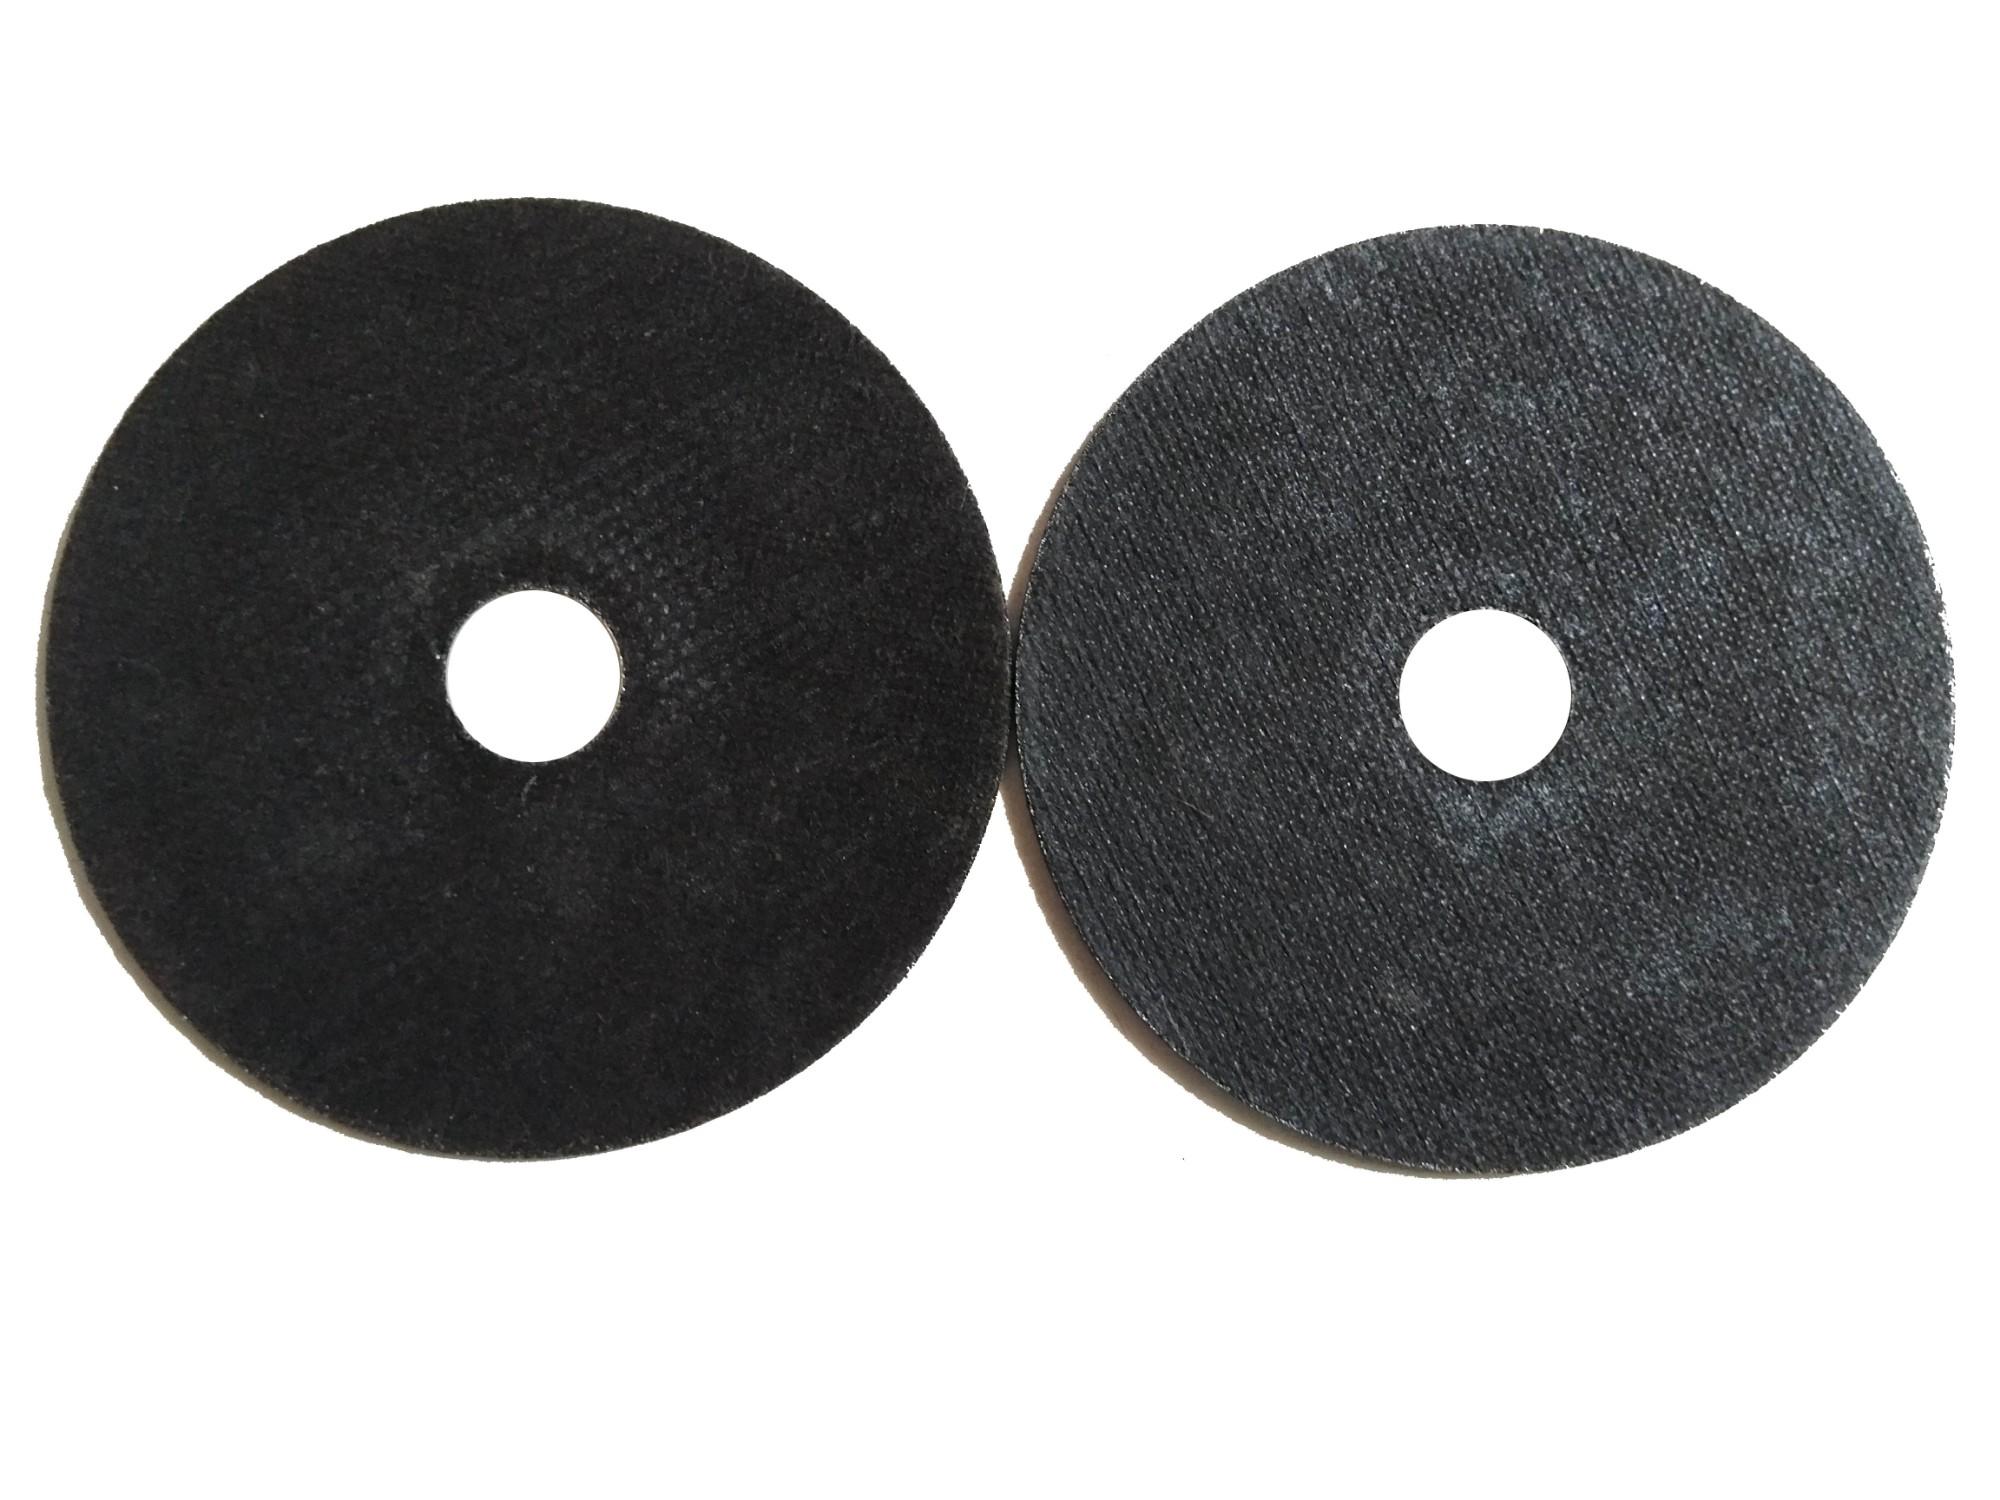 Concret Cutting Disc For Bench Grinder Manufacturers, Concret Cutting Disc For Bench Grinder Factory, Supply Concret Cutting Disc For Bench Grinder